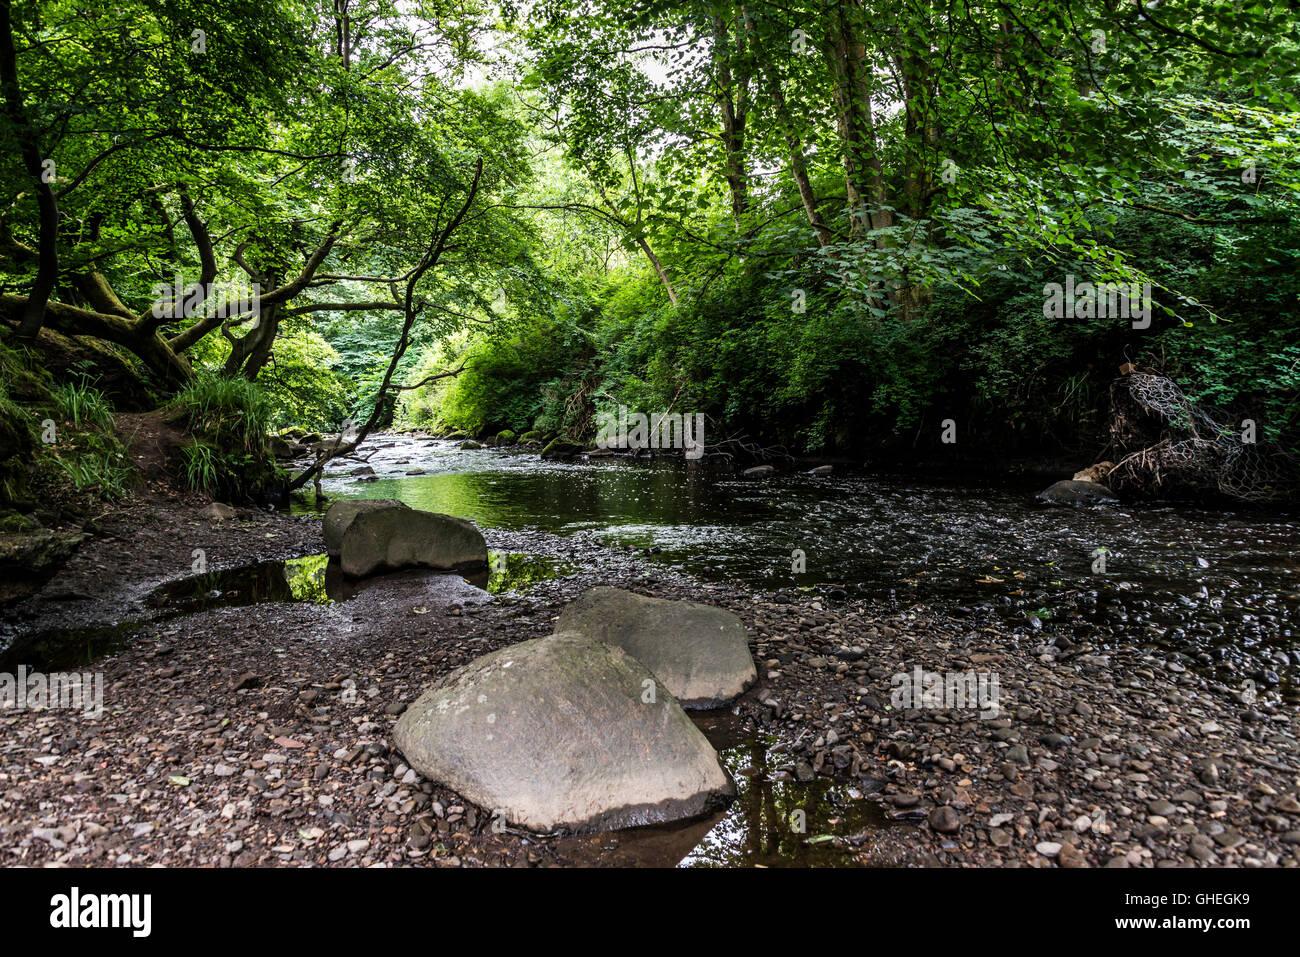 Harwood water, Livingston, West Lothian, Scotland - Stock Image